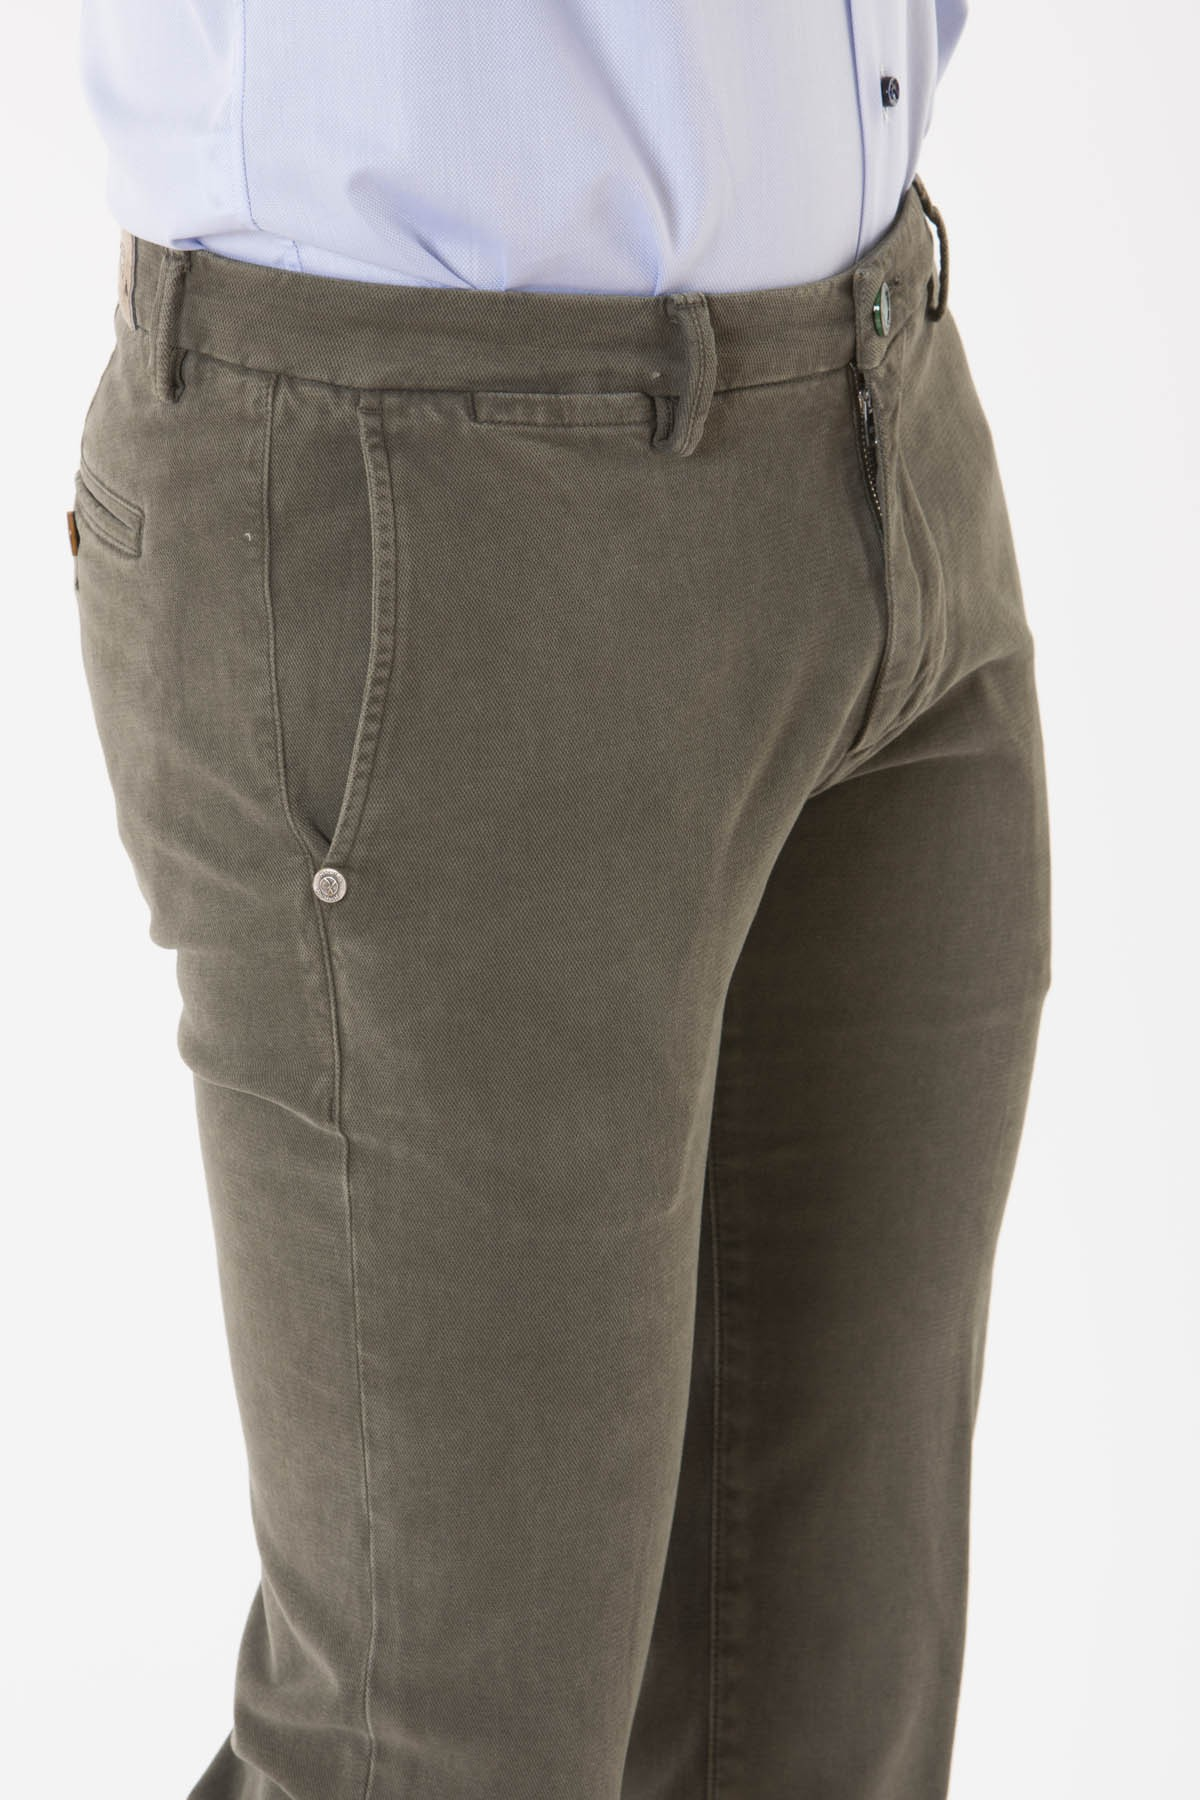 Pantaloni MUCHA per uomo RE HASH AI 18 19